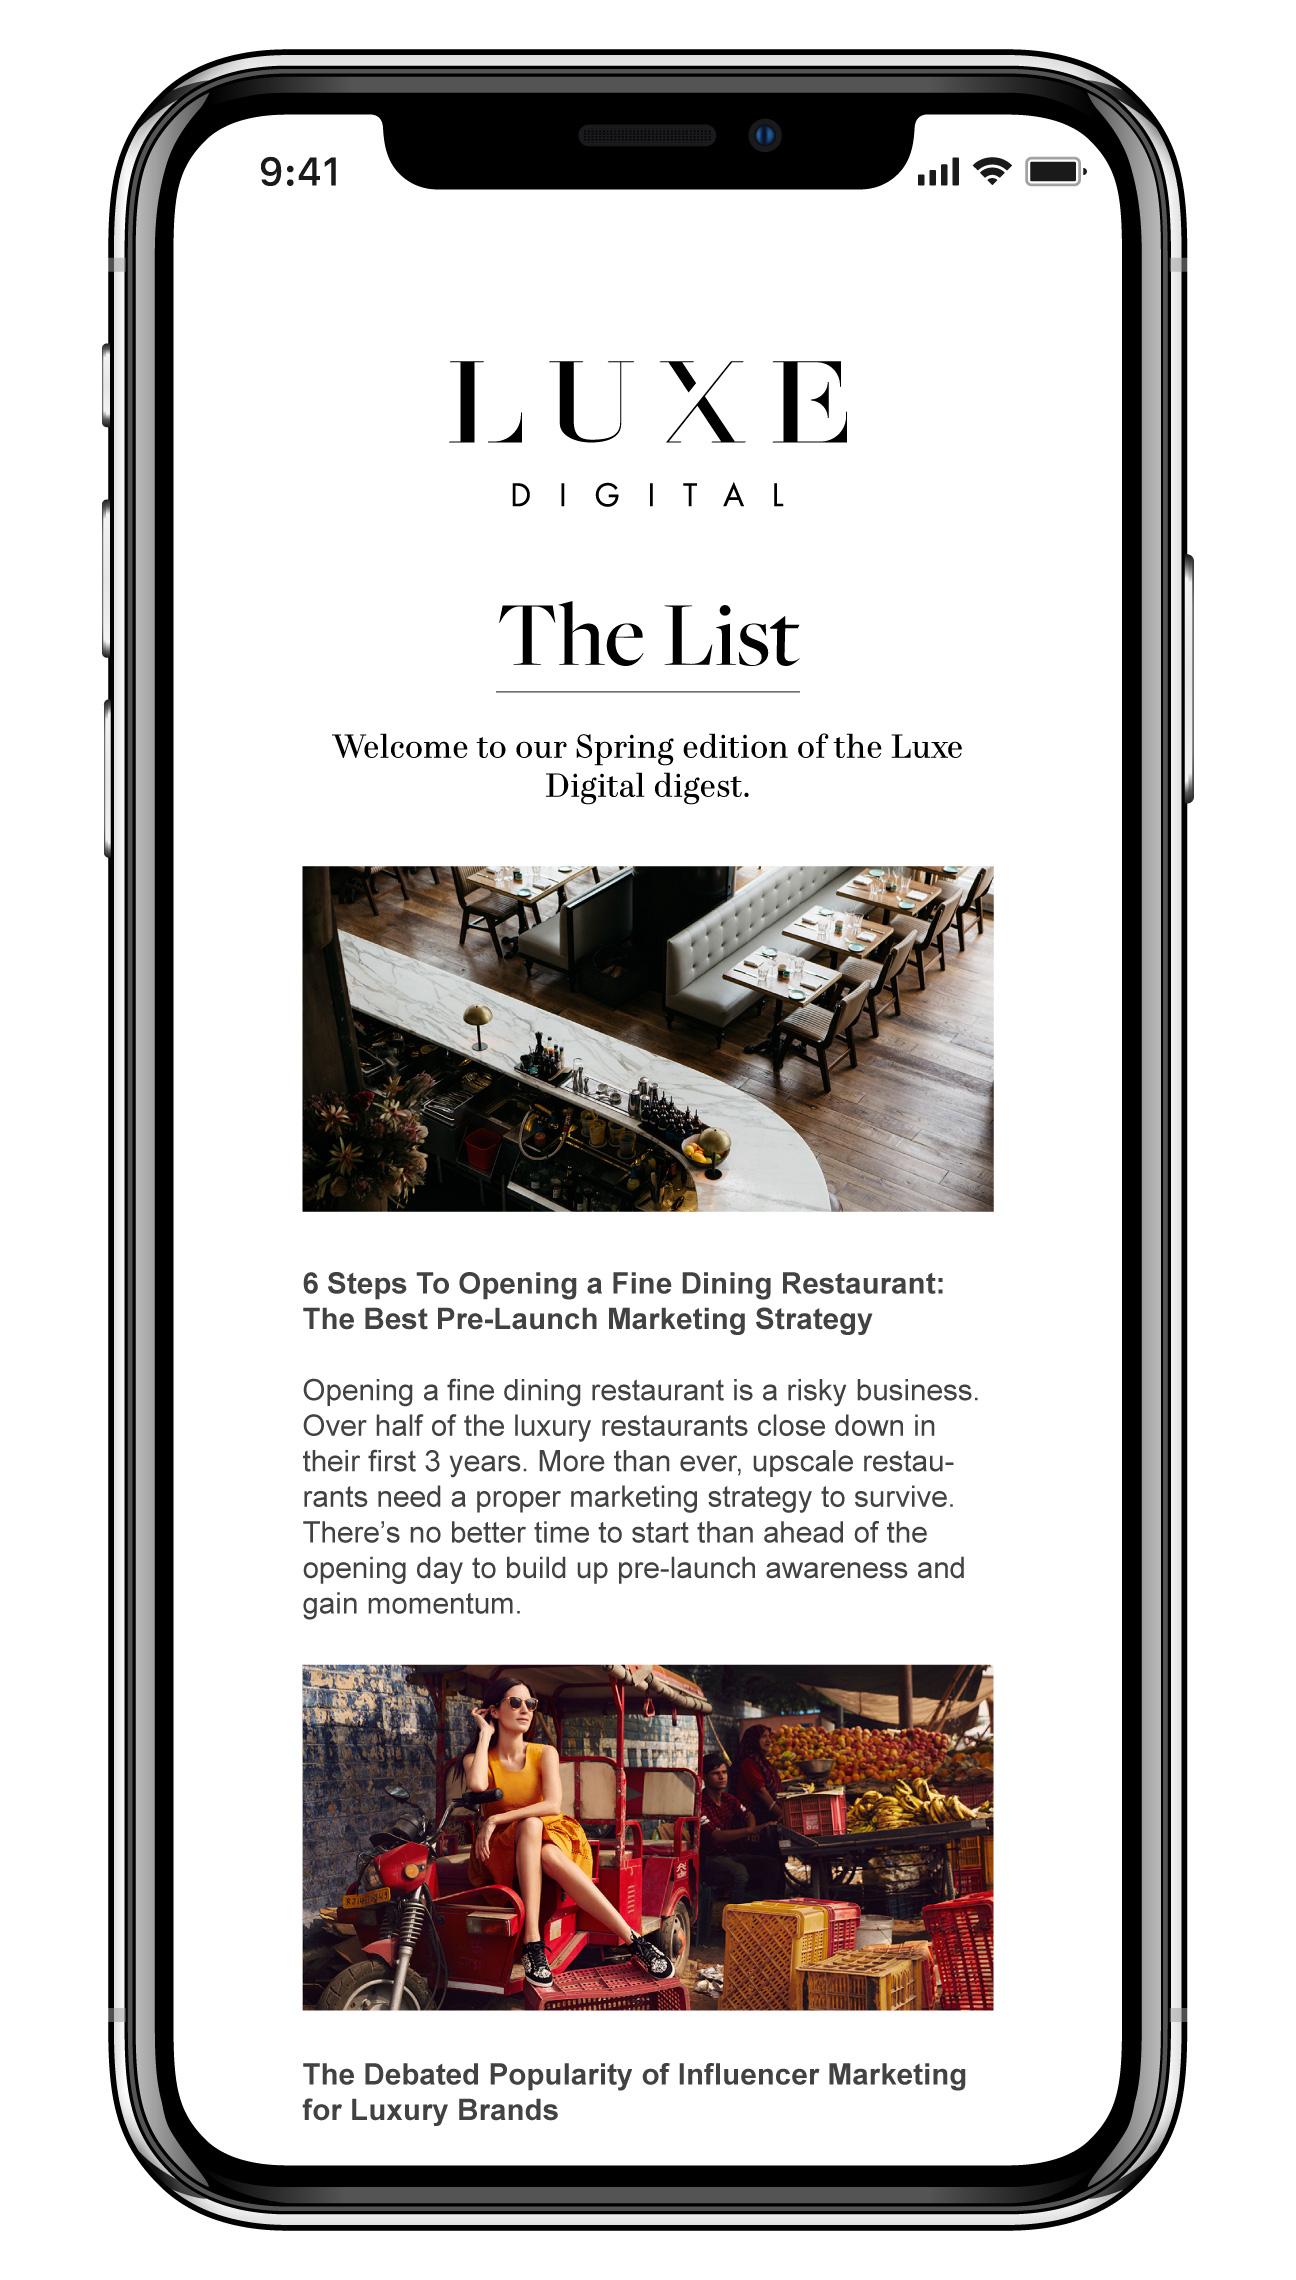 luxe digital luxury publication professional industry newsletter mockup